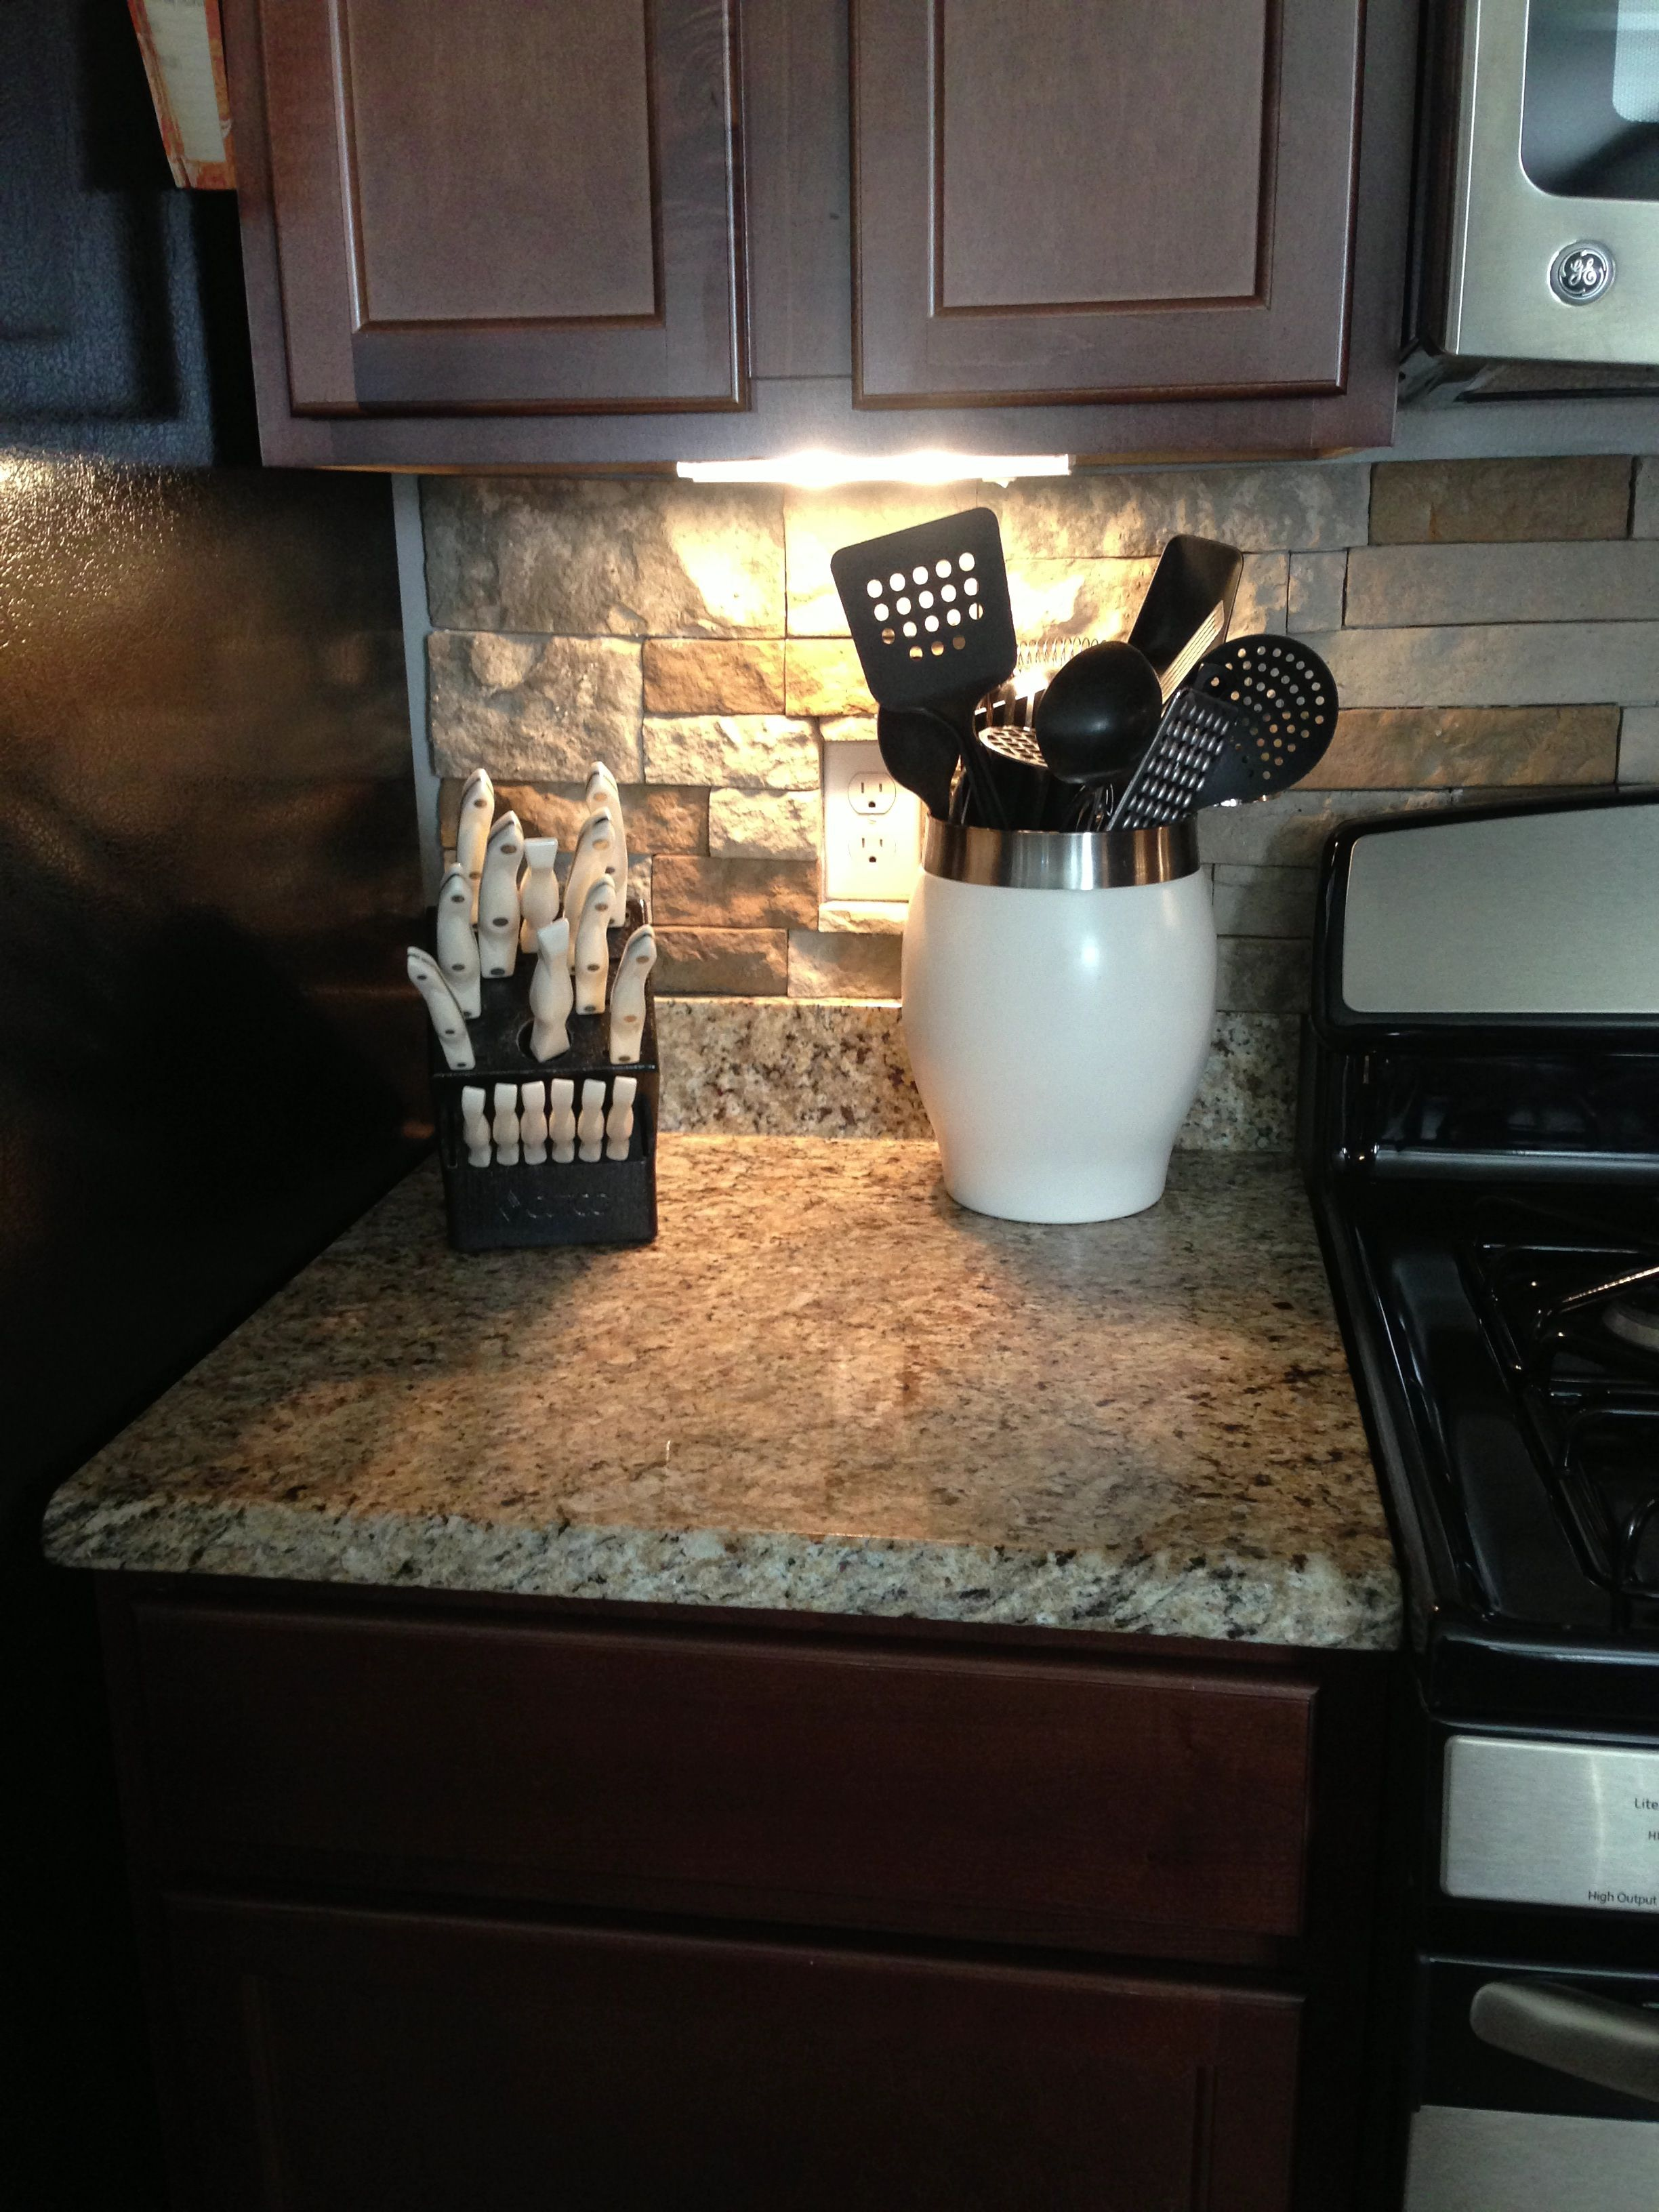 Stone Backsplash, Granite Countertops, Dark Wood Cabinets | Our ...